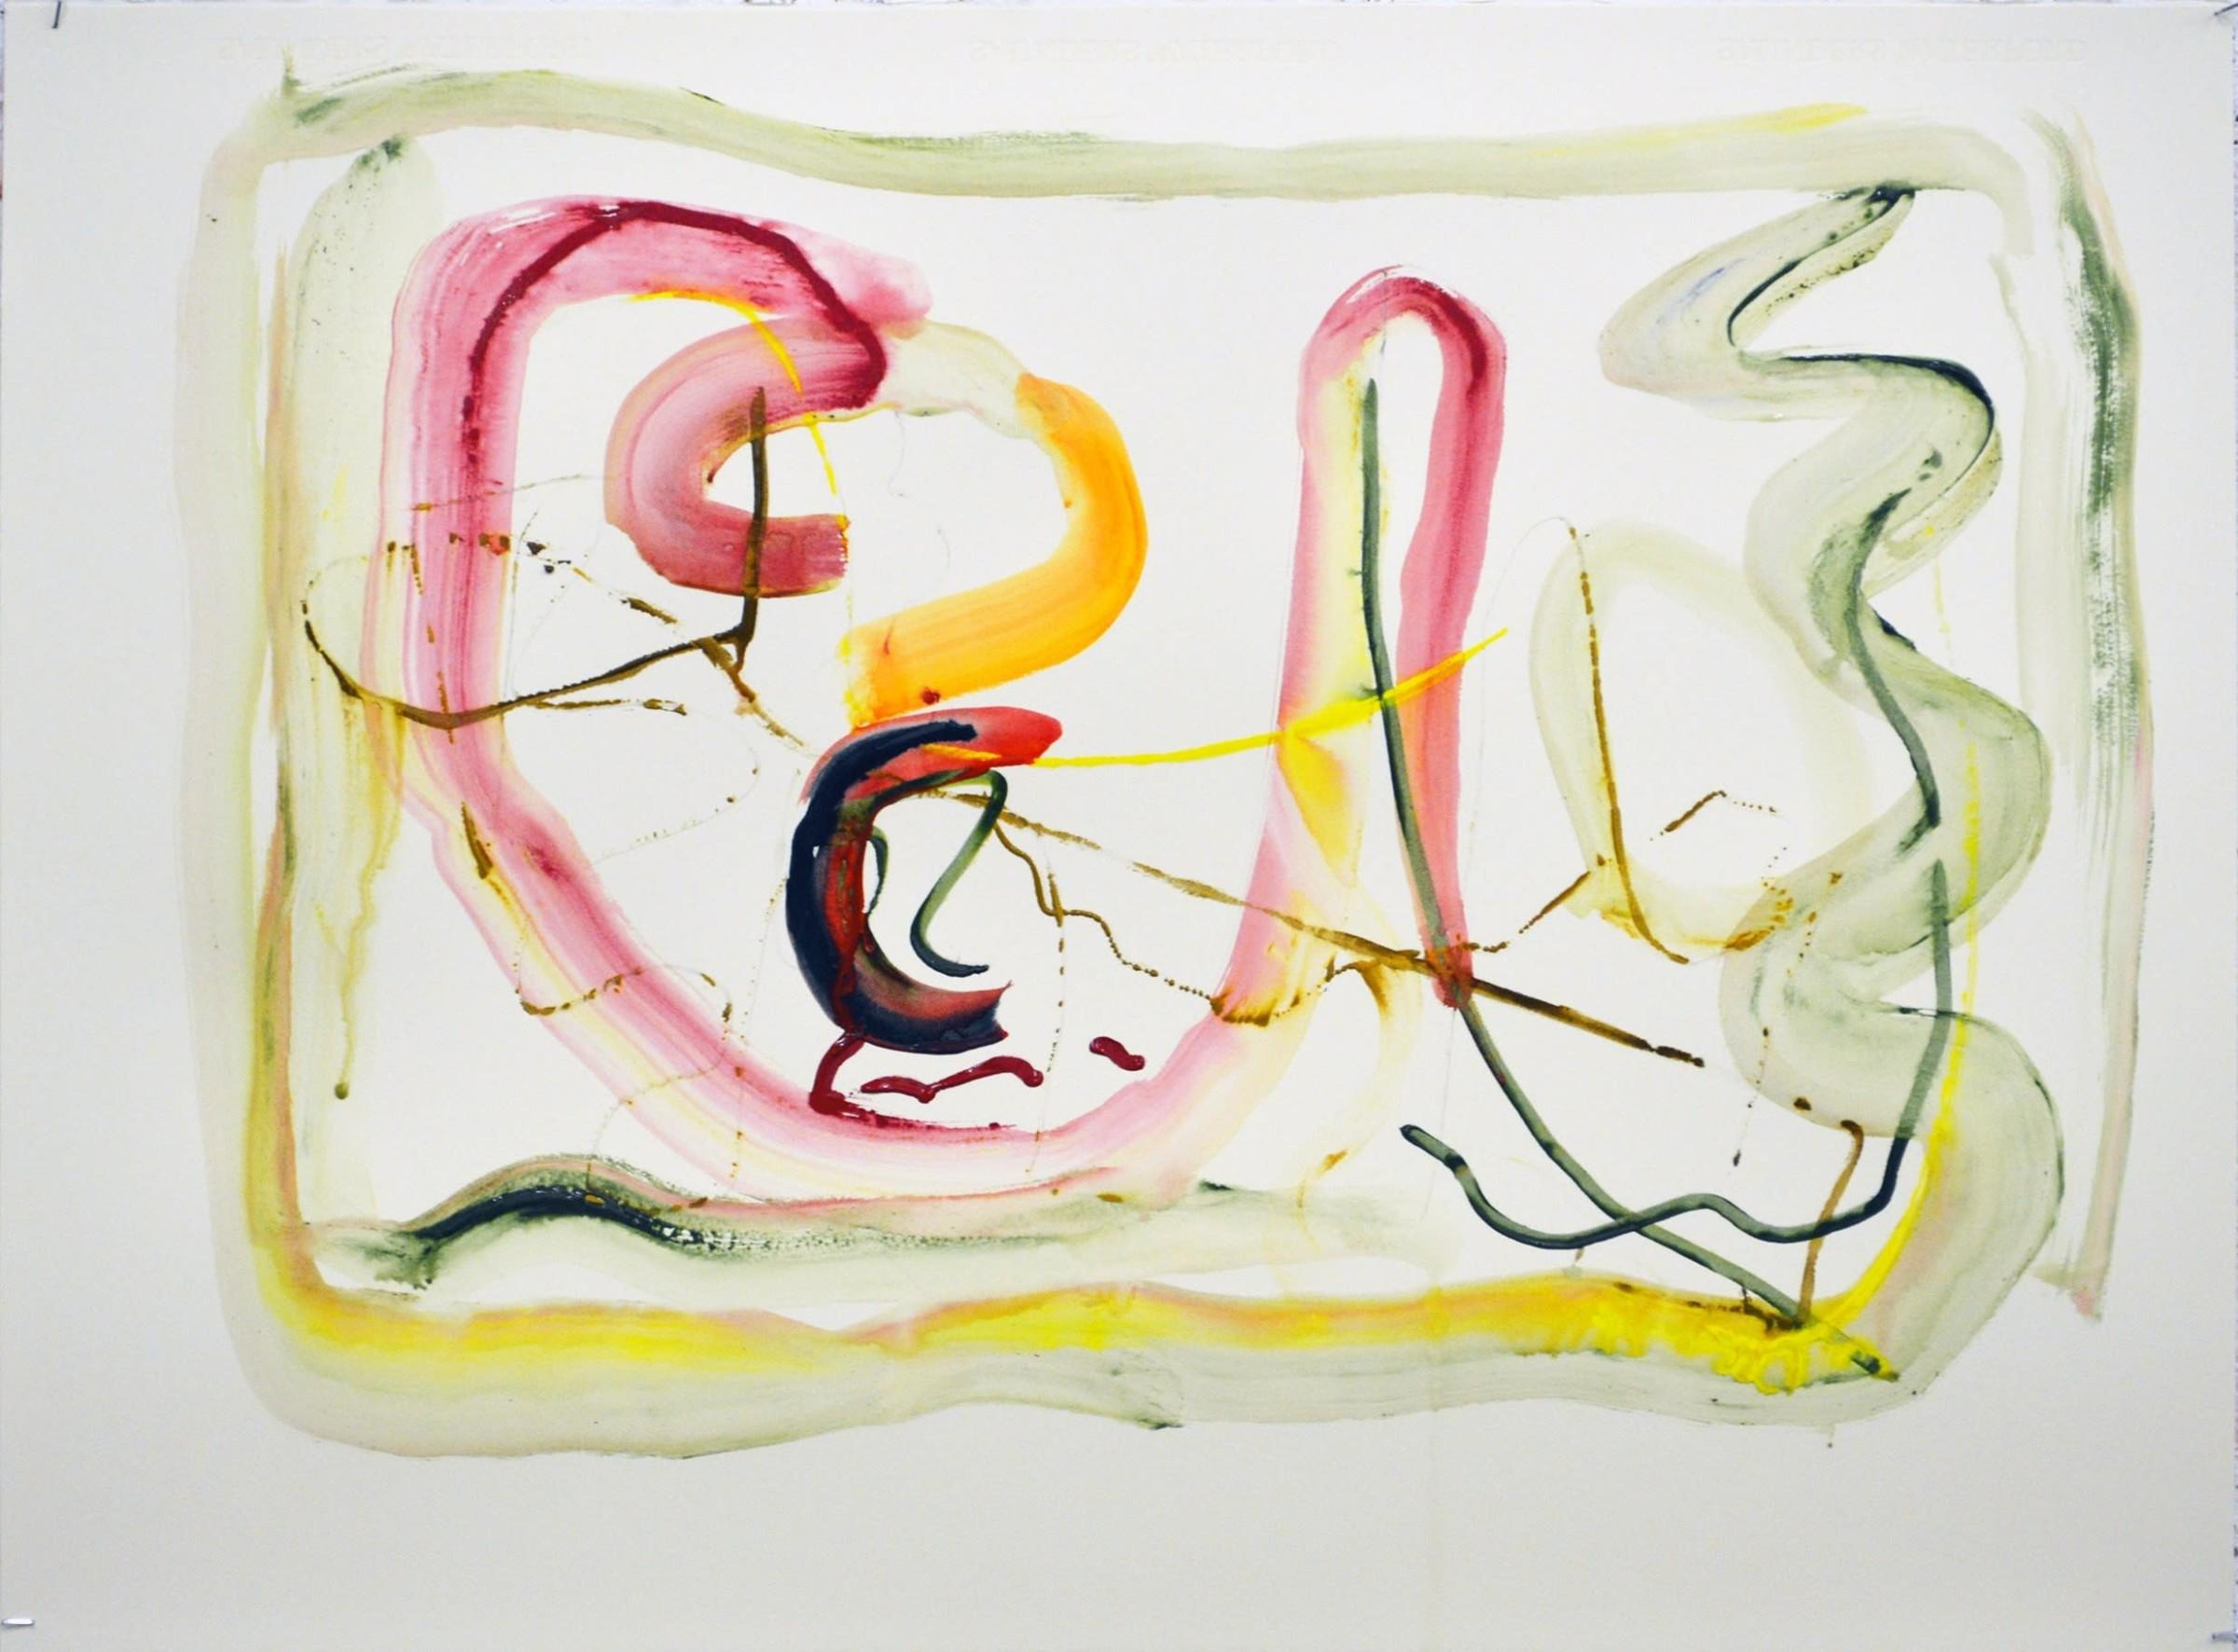 "<span class=""link fancybox-details-link""><a href=""/artists/32-james-faure-walker/works/12050-james-faure-walker-the-mime-2020/"">View Detail Page</a></span><div class=""artist""><span class=""artist""><strong>James Faure Walker</strong></span></div><div class=""title""><em>The Mime, 2020</em></div><div class=""medium"">watercolour</div><div class=""dimensions"">Frame: 80 x 100 cm<br /> Artwork: 56 x 76 cm</div><div class=""price"">£1,900.00</div>"